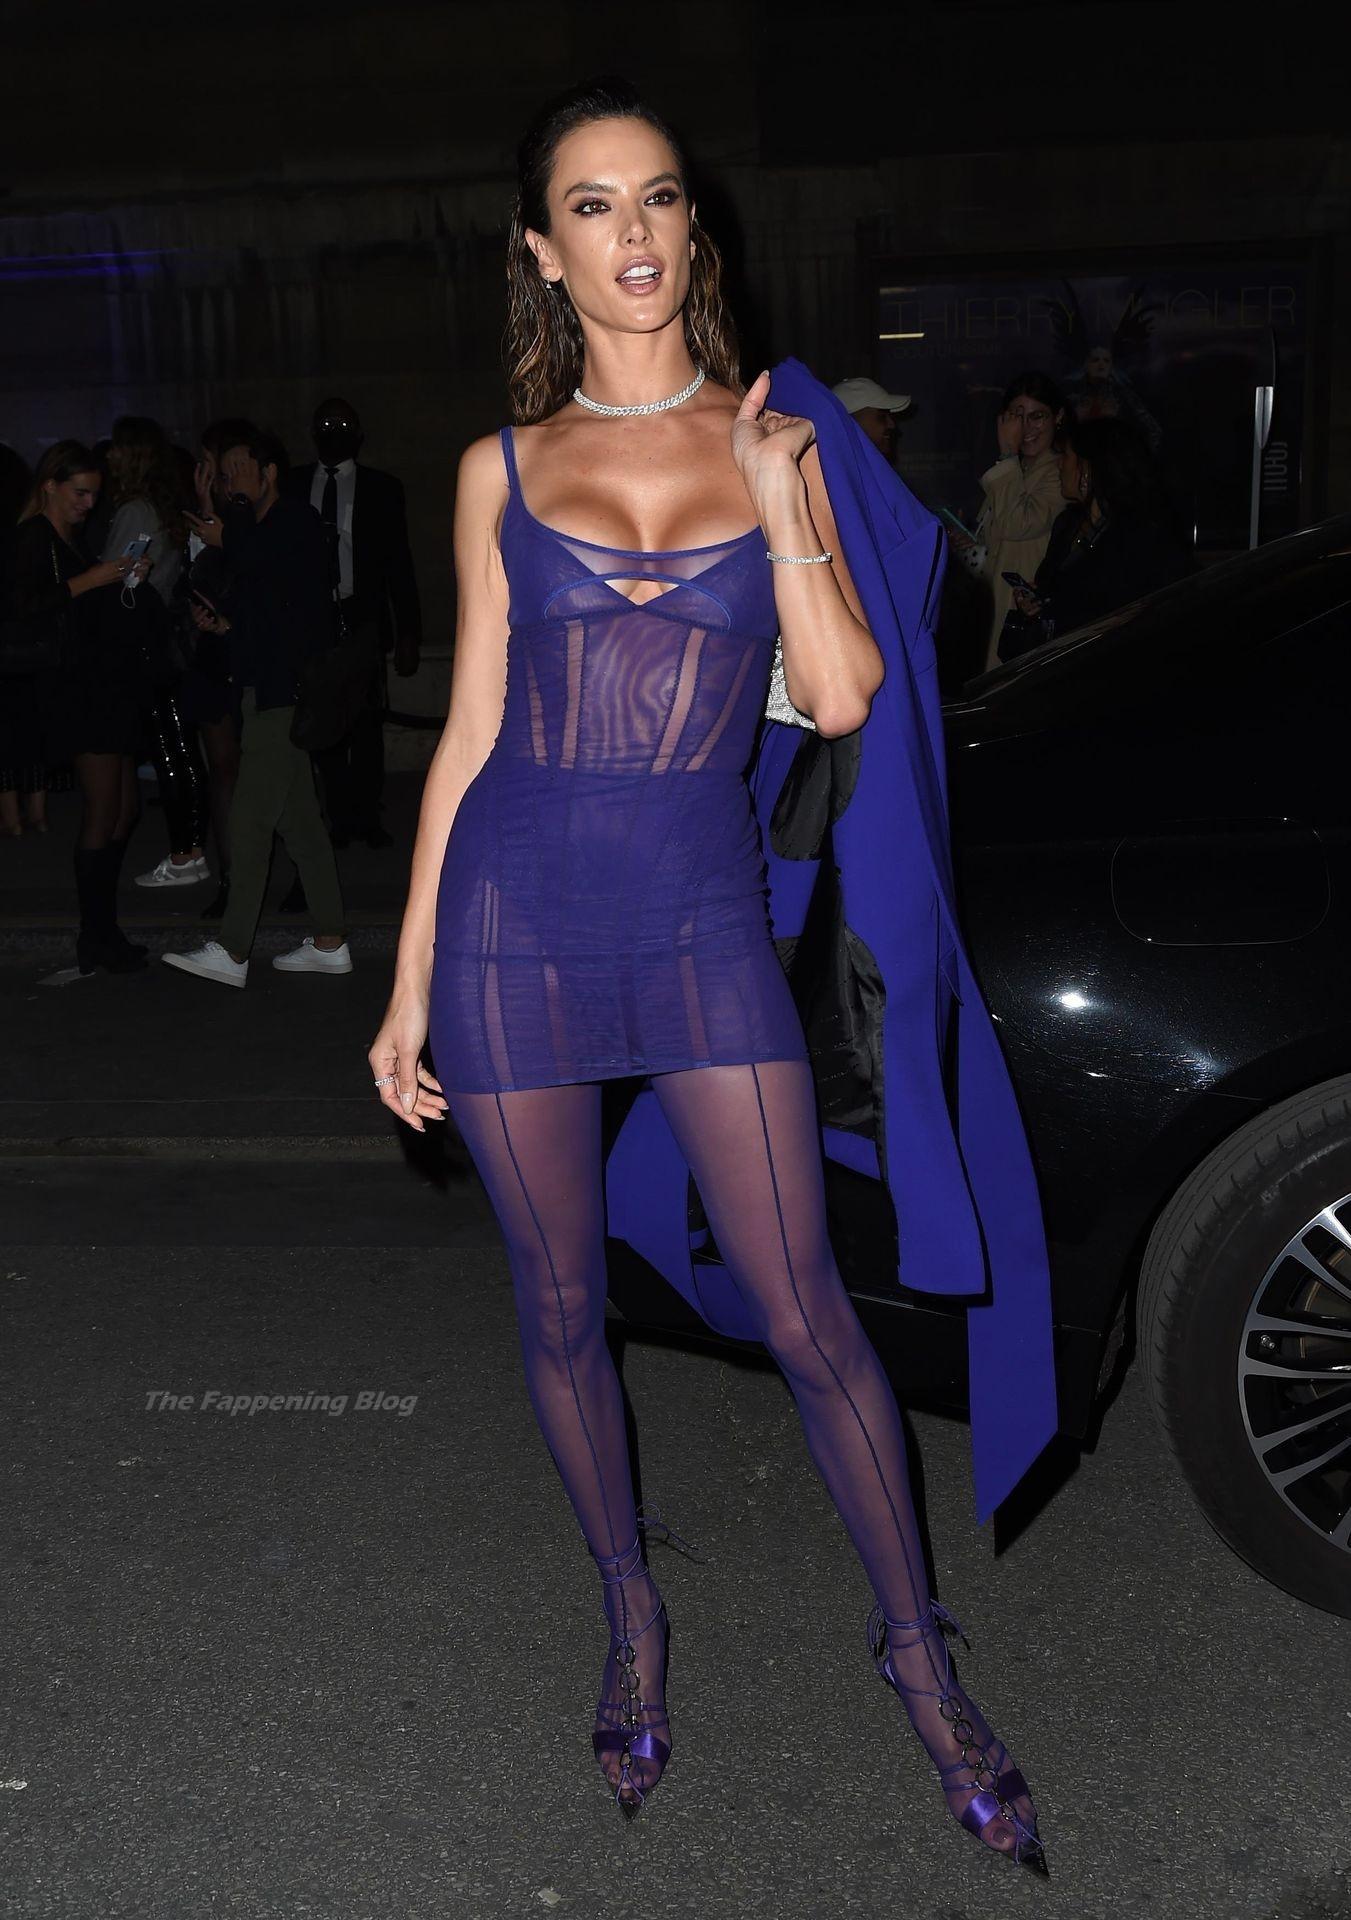 Alessandra-Ambrosio-Sexy-The-Fappening-Blog-22-2.jpg